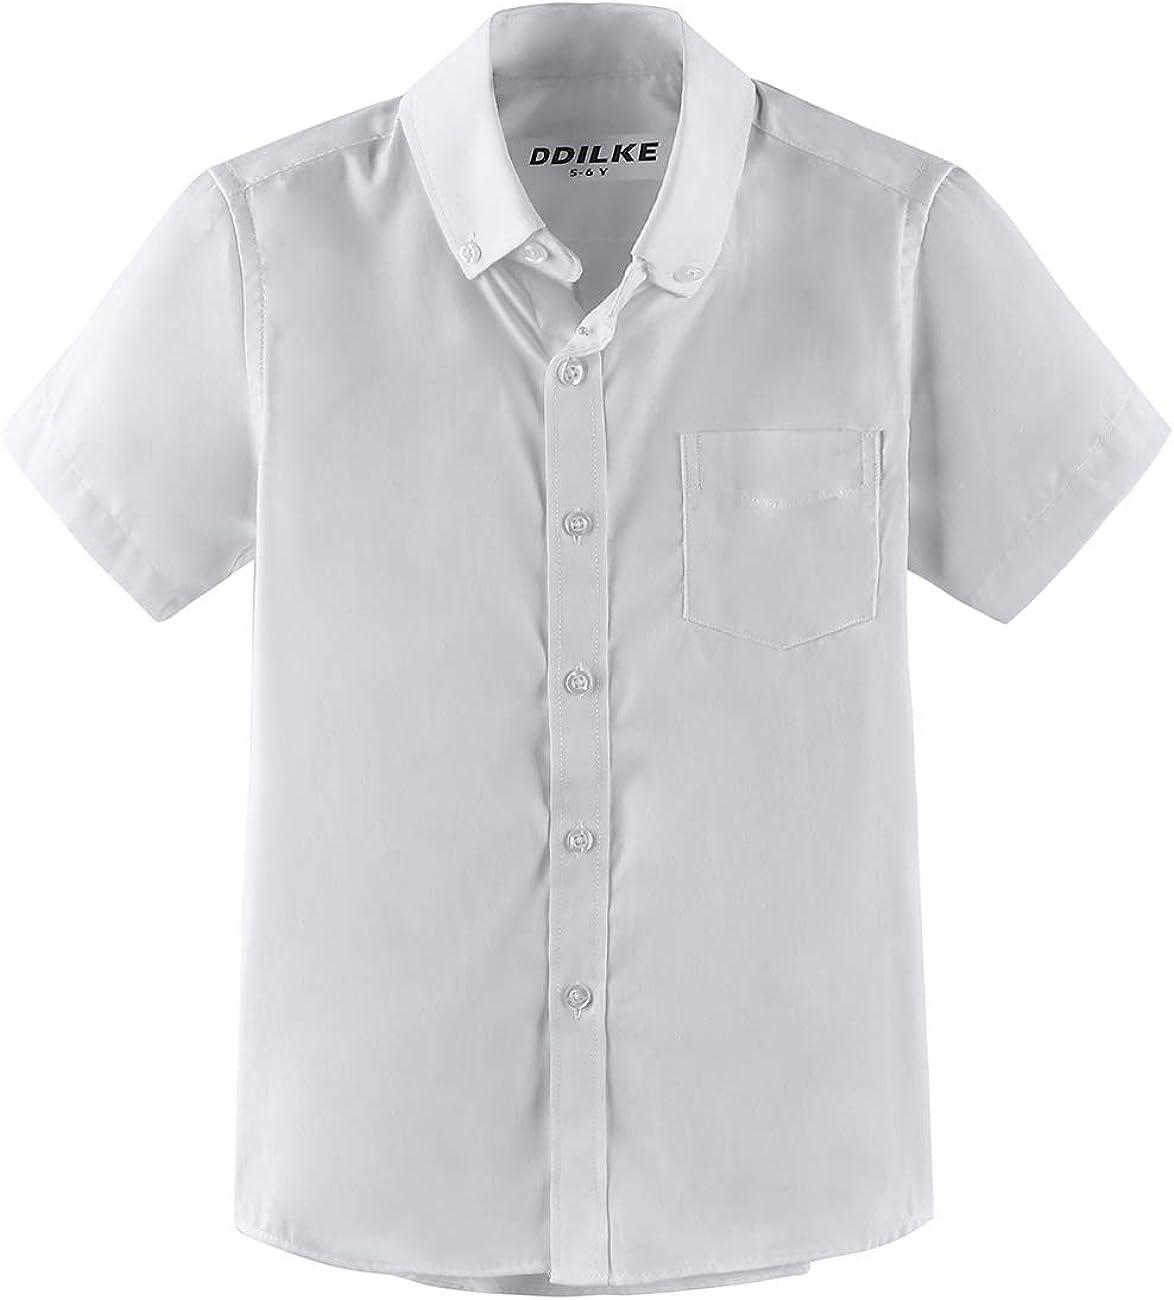 Boys Dress Shirt Short Sleeve Uniform Oxford Shirts (Regular Fit)